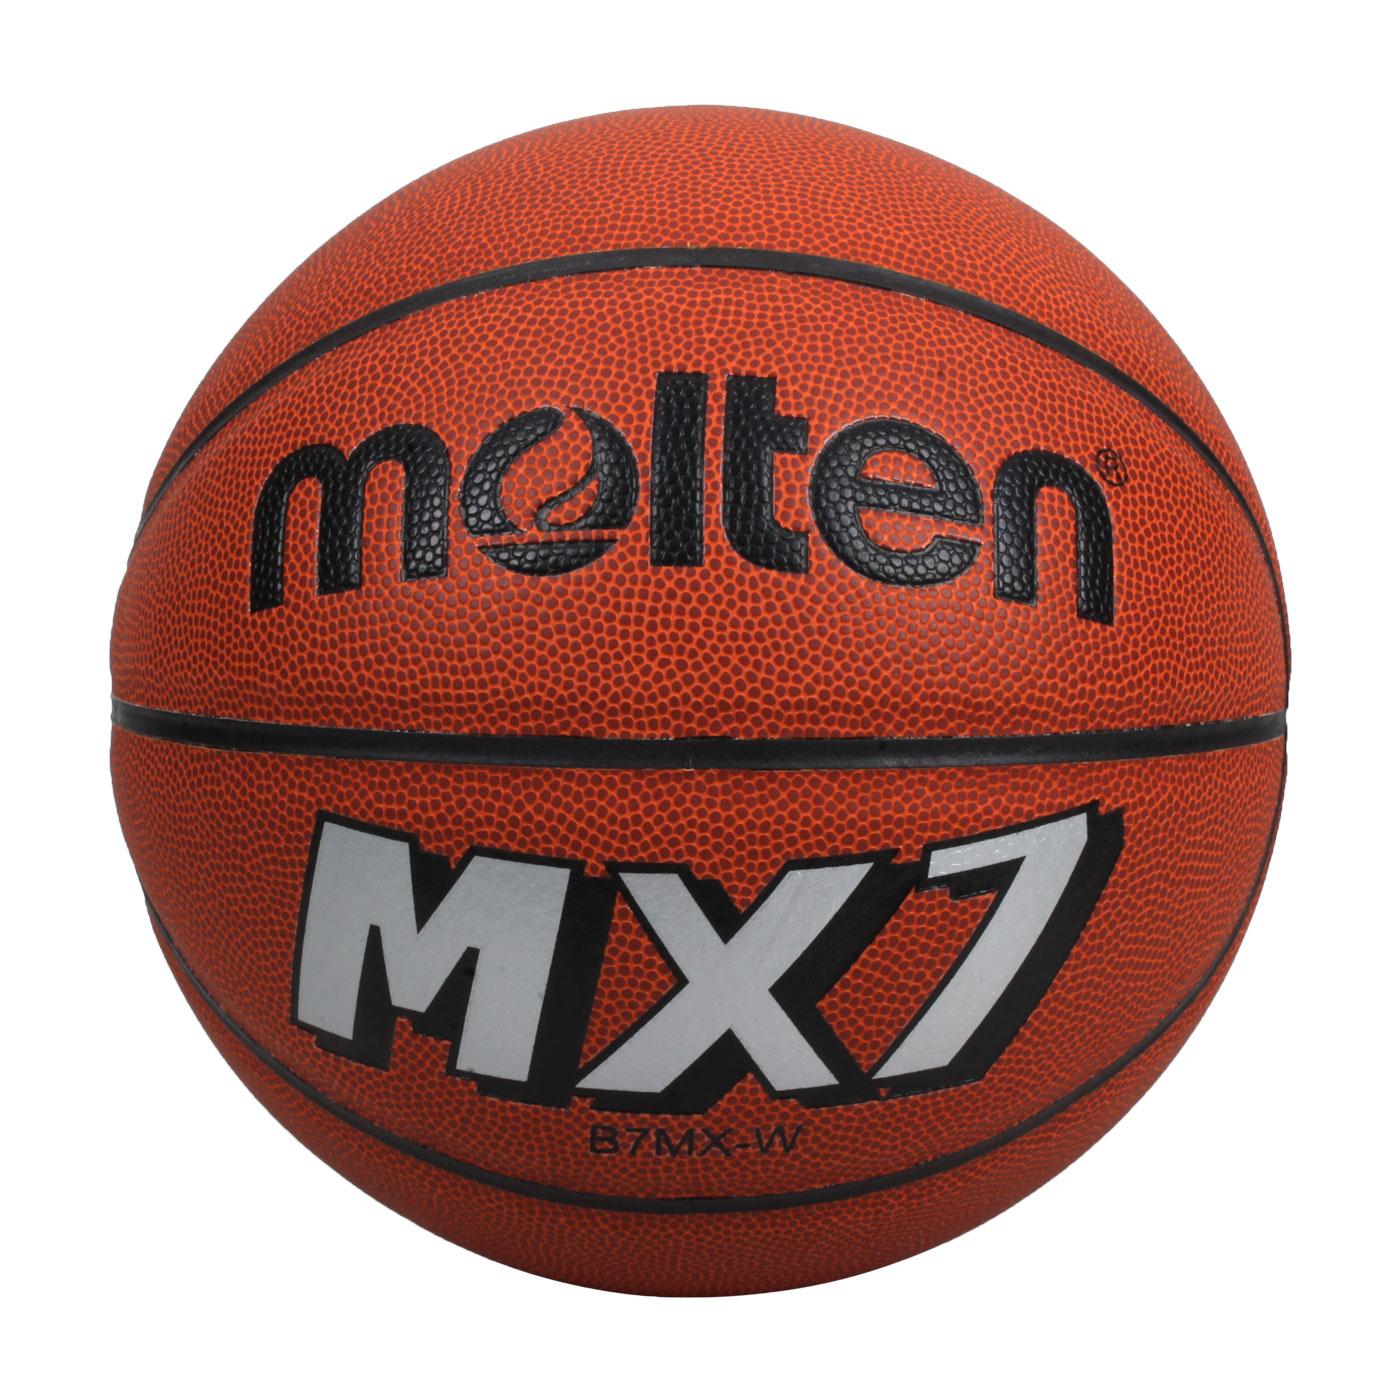 Molten 8片貼合成皮籃球(平溝) B7MX-W - 橘黑銀